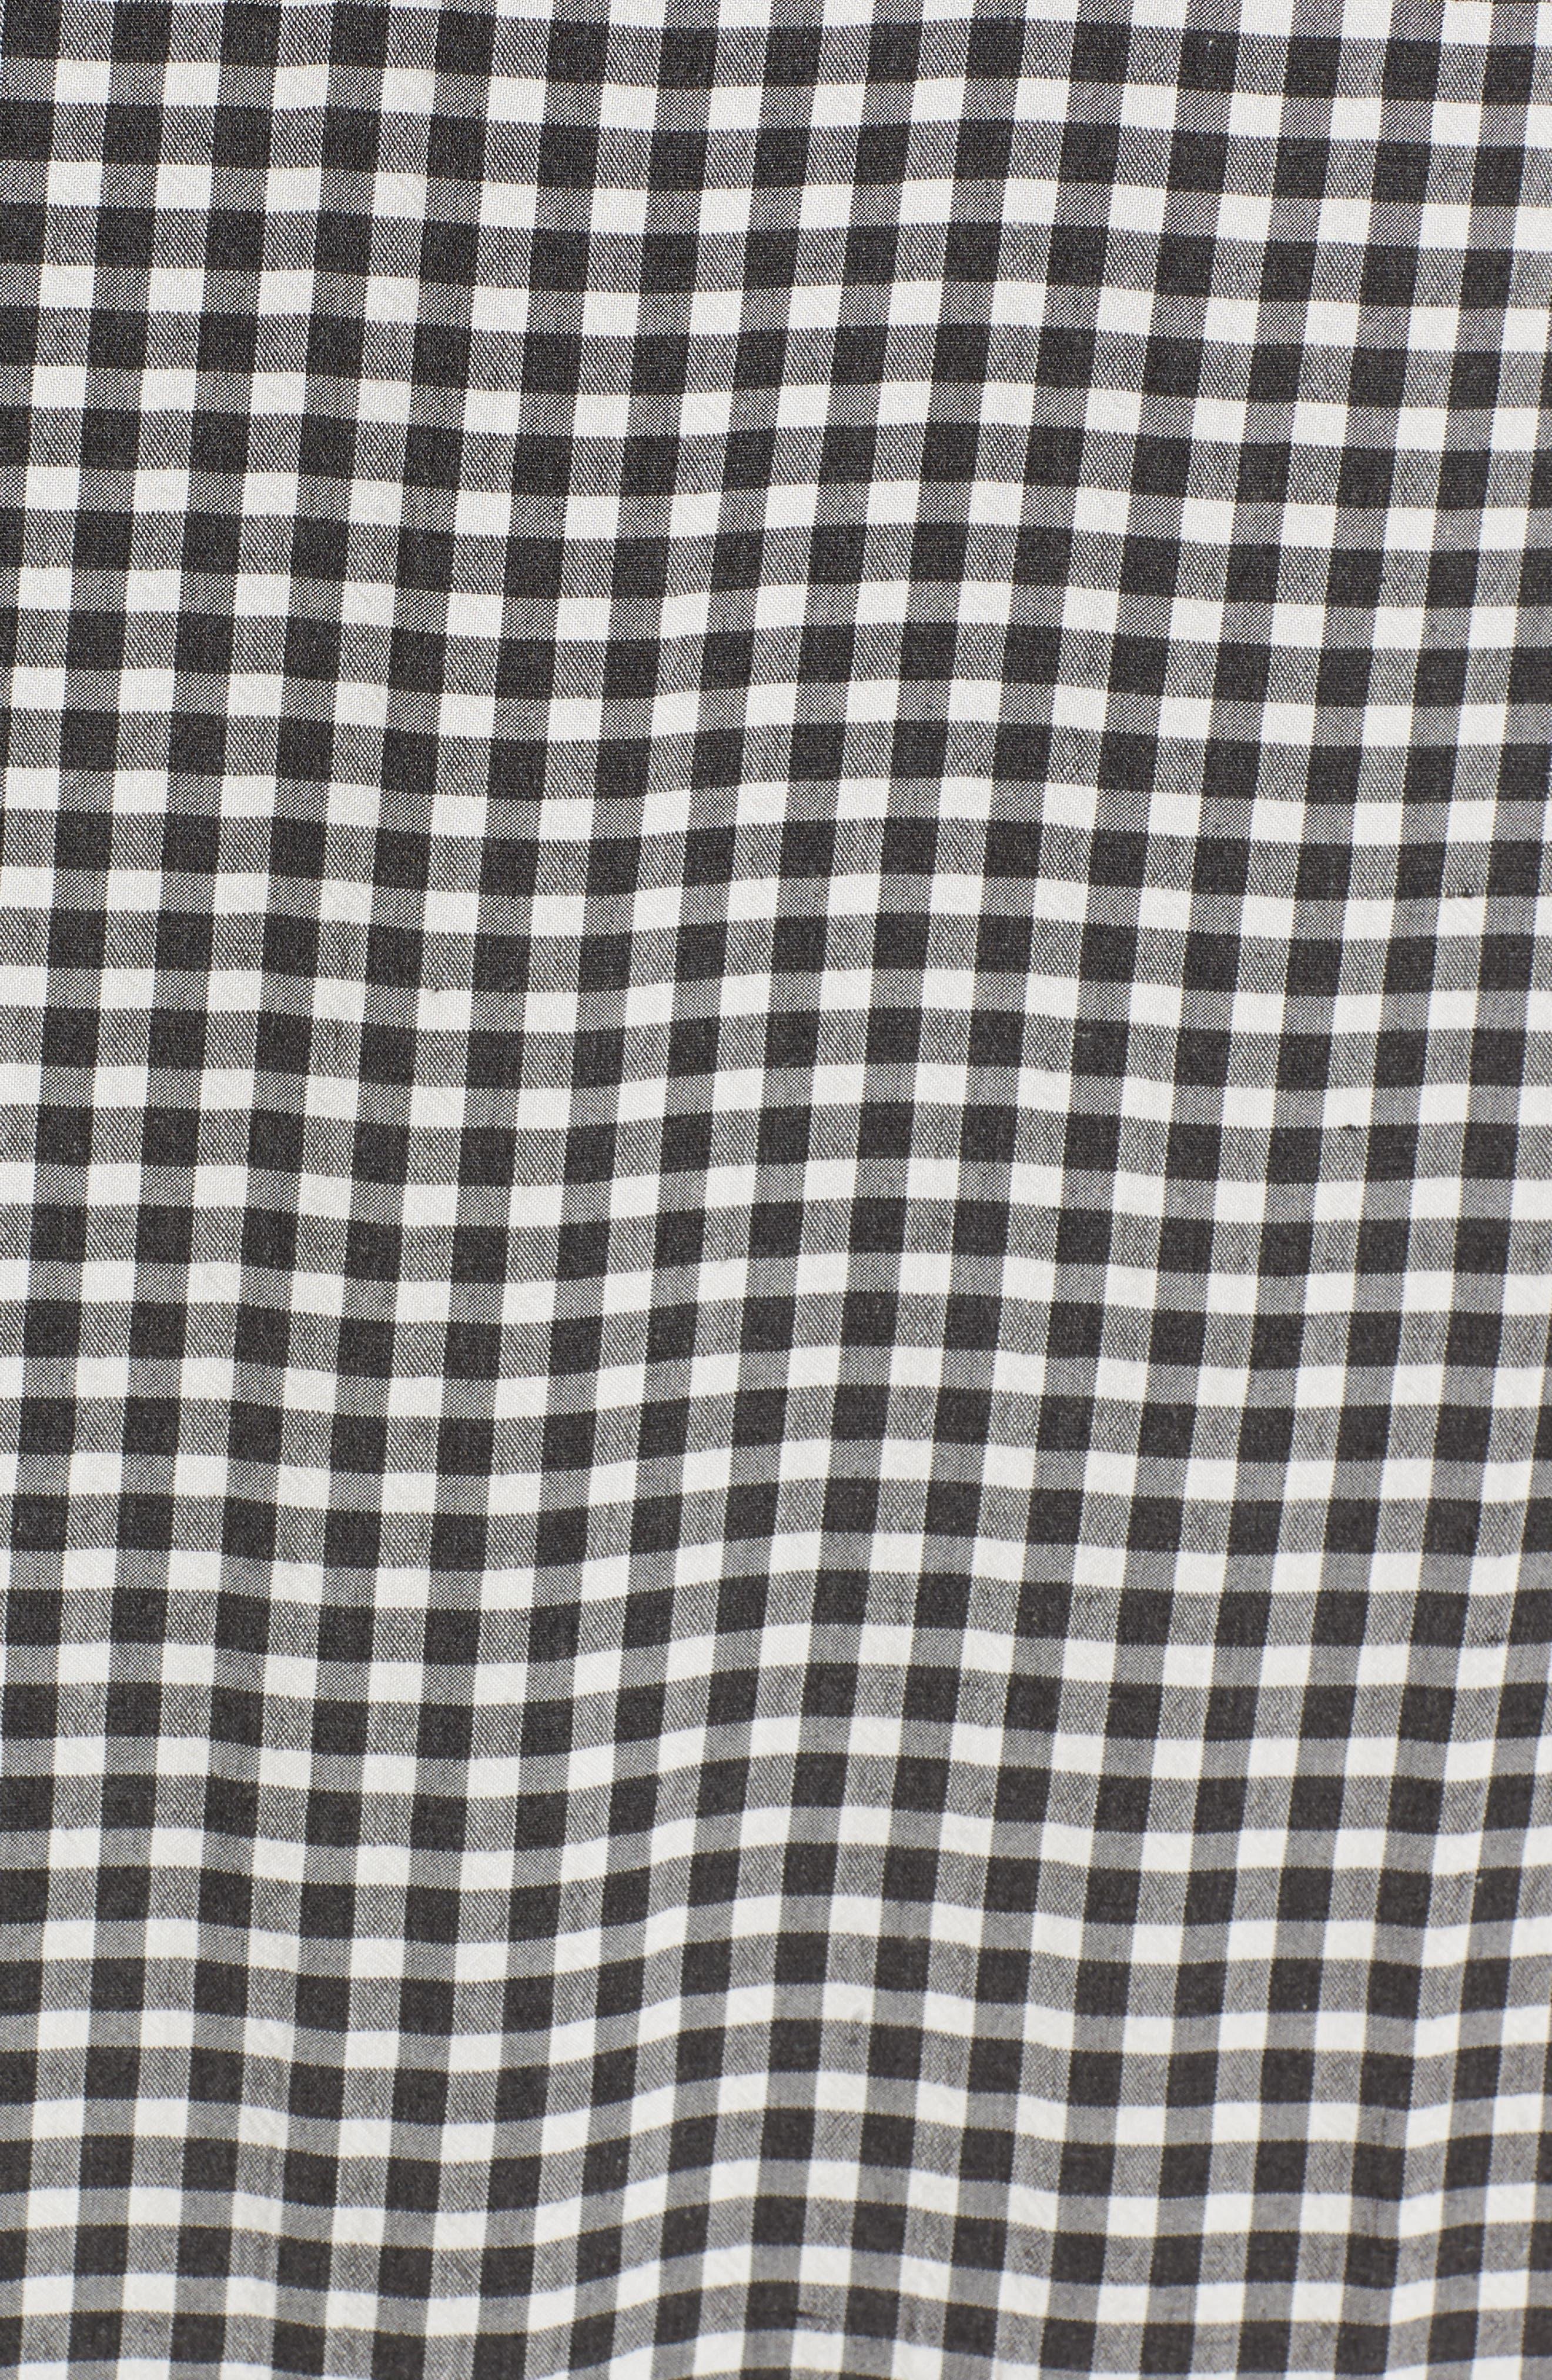 Embroidered Sleeve Shift Dress,                             Alternate thumbnail 7, color,                             Black-White Gingham